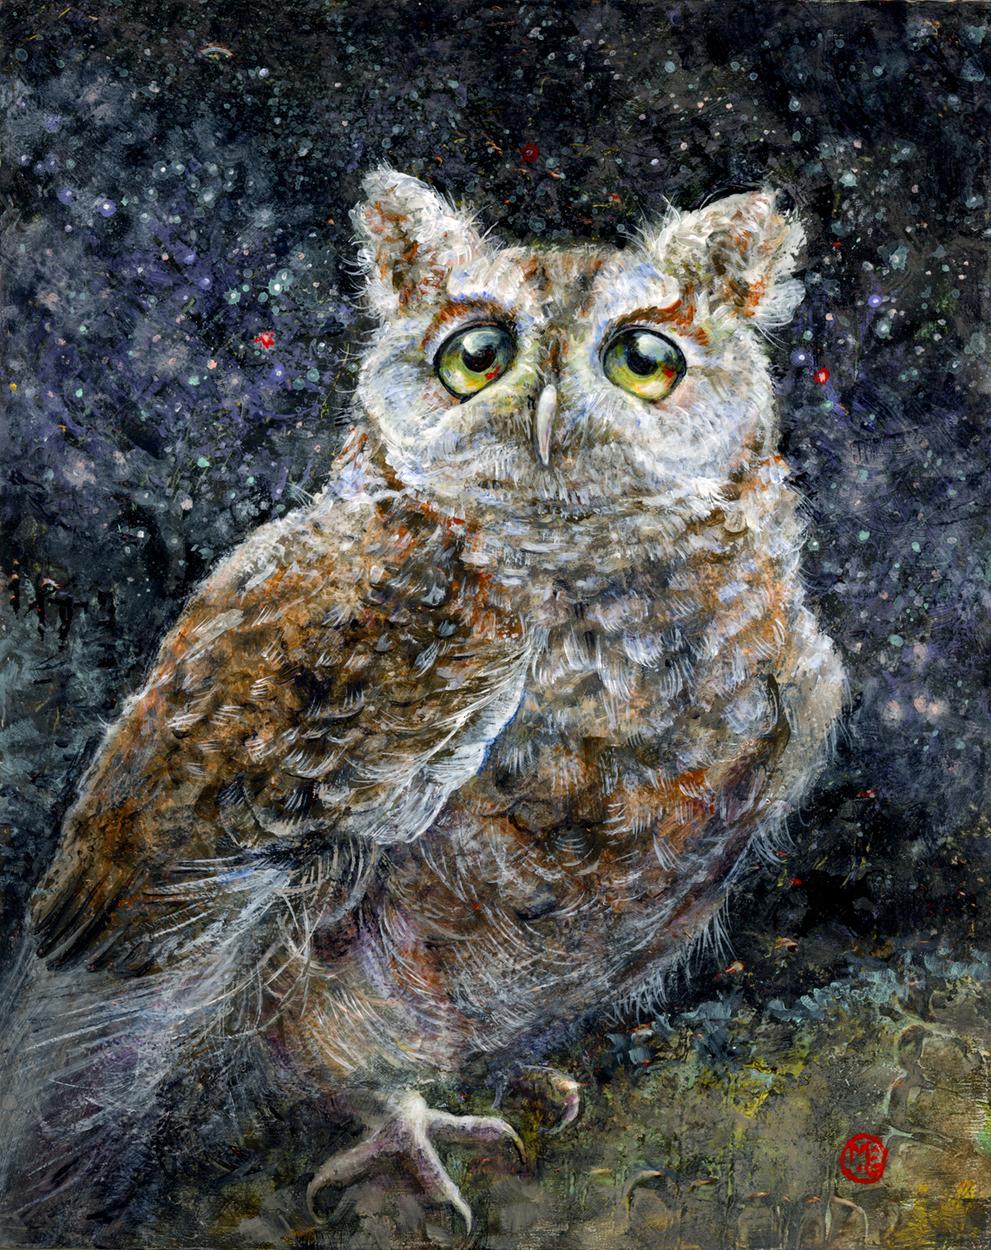 Screech Owl Ponders the Milky Way Artwork by Melissa Gay